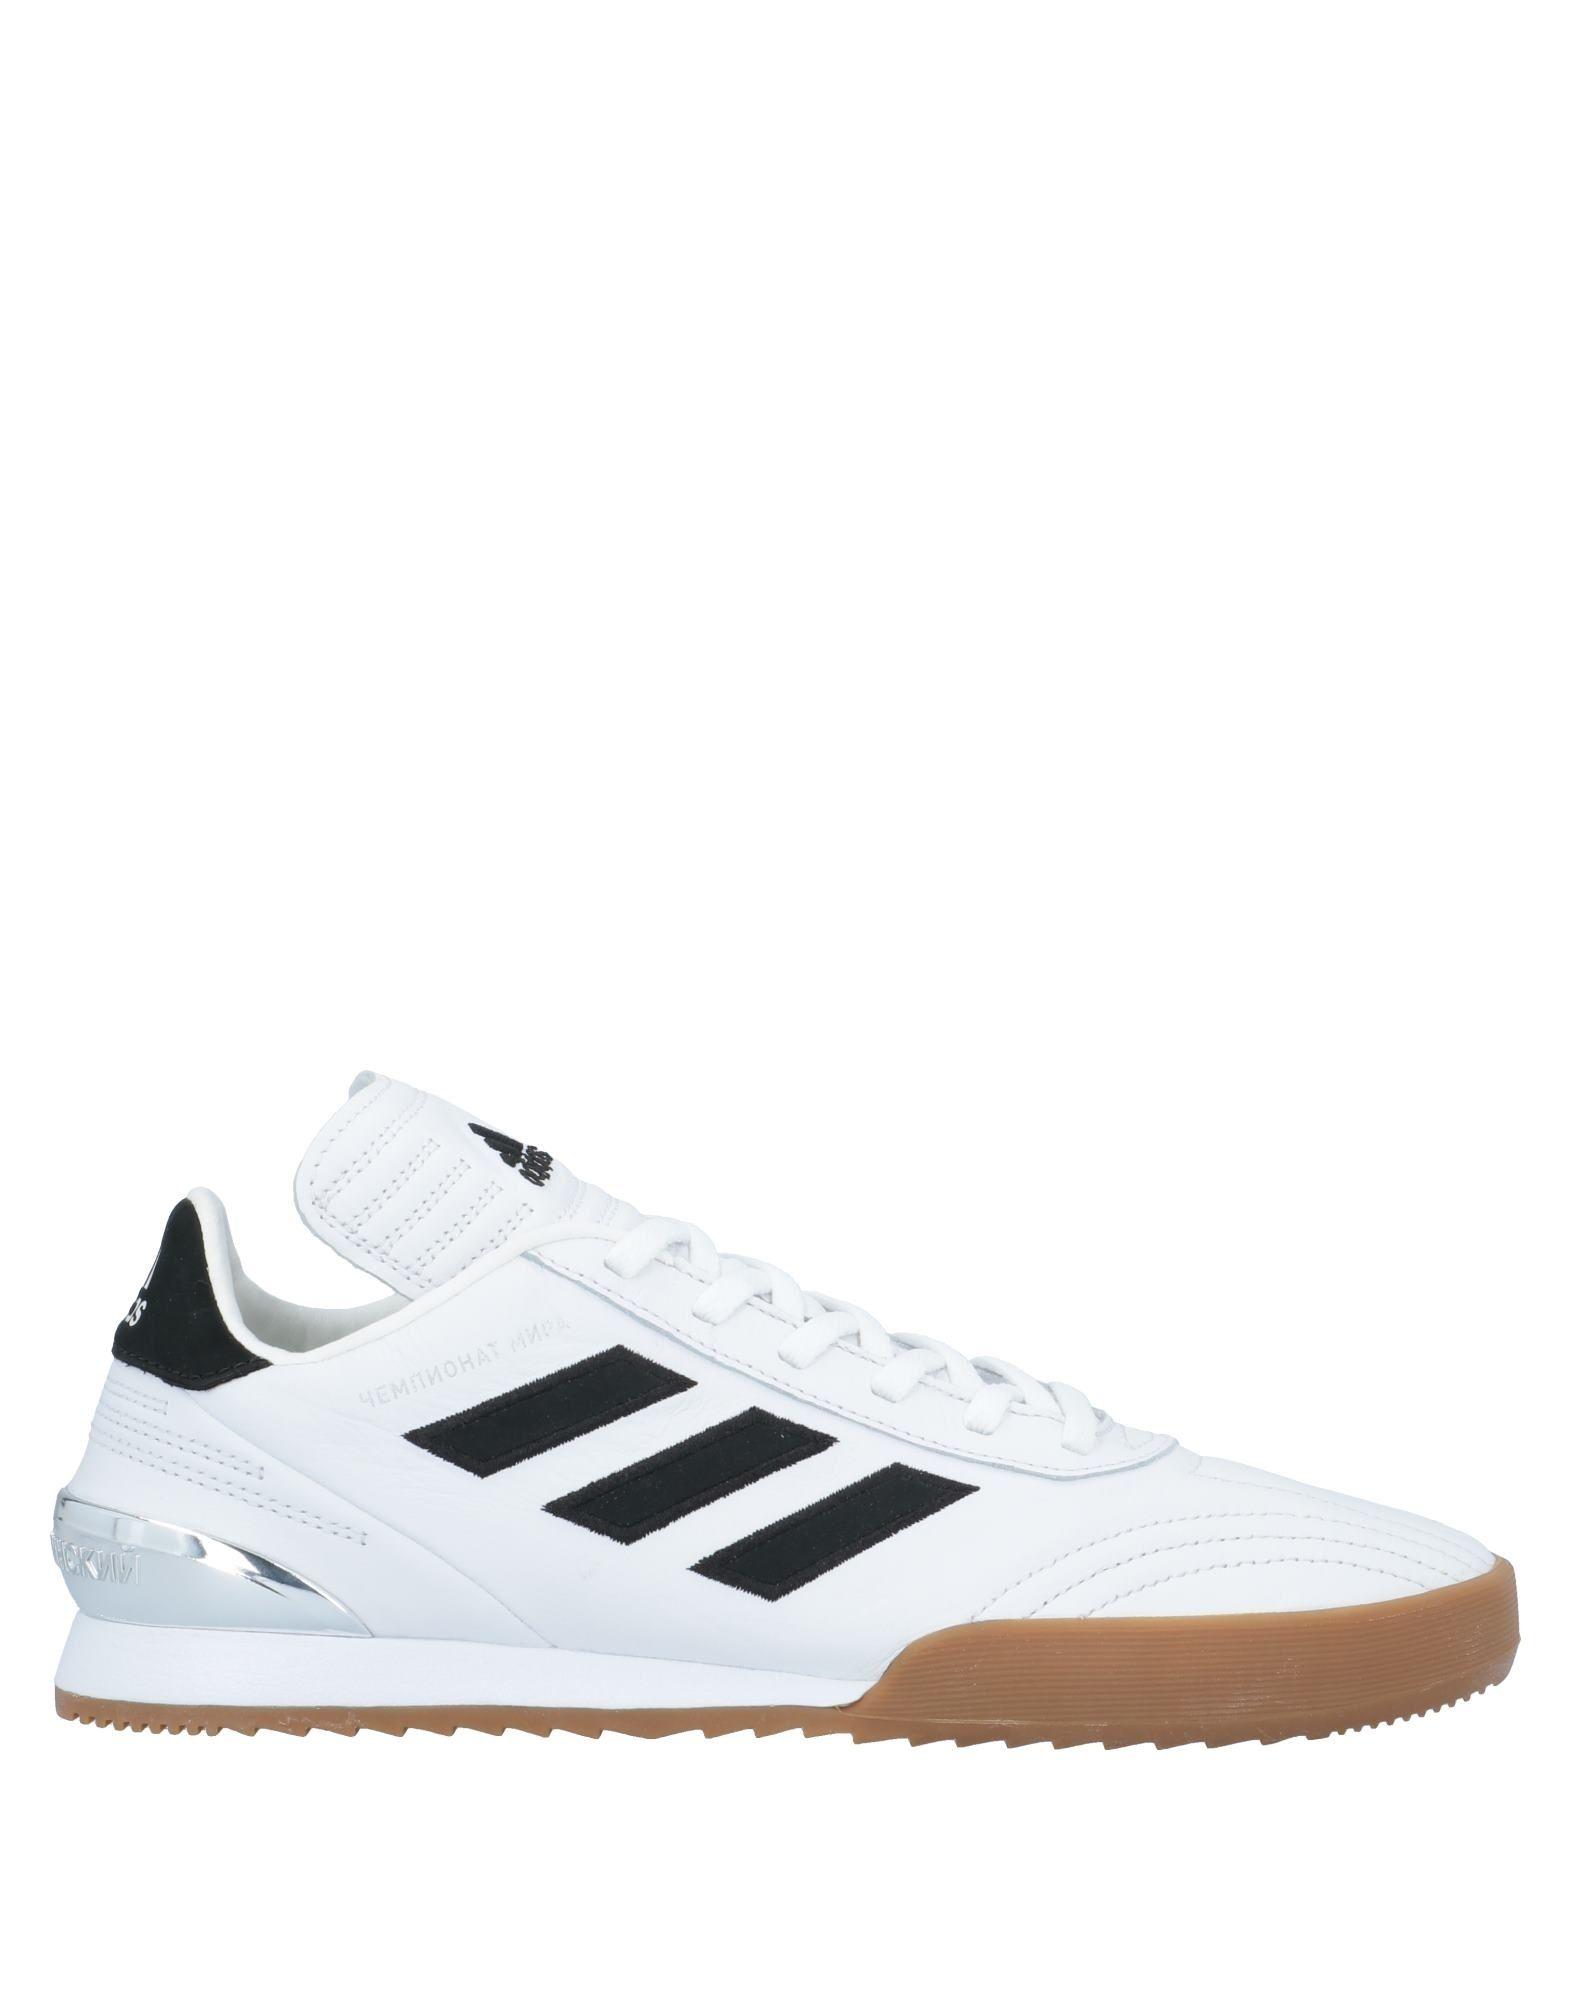 Turnschuhe Adidas herren - 11681662VQ